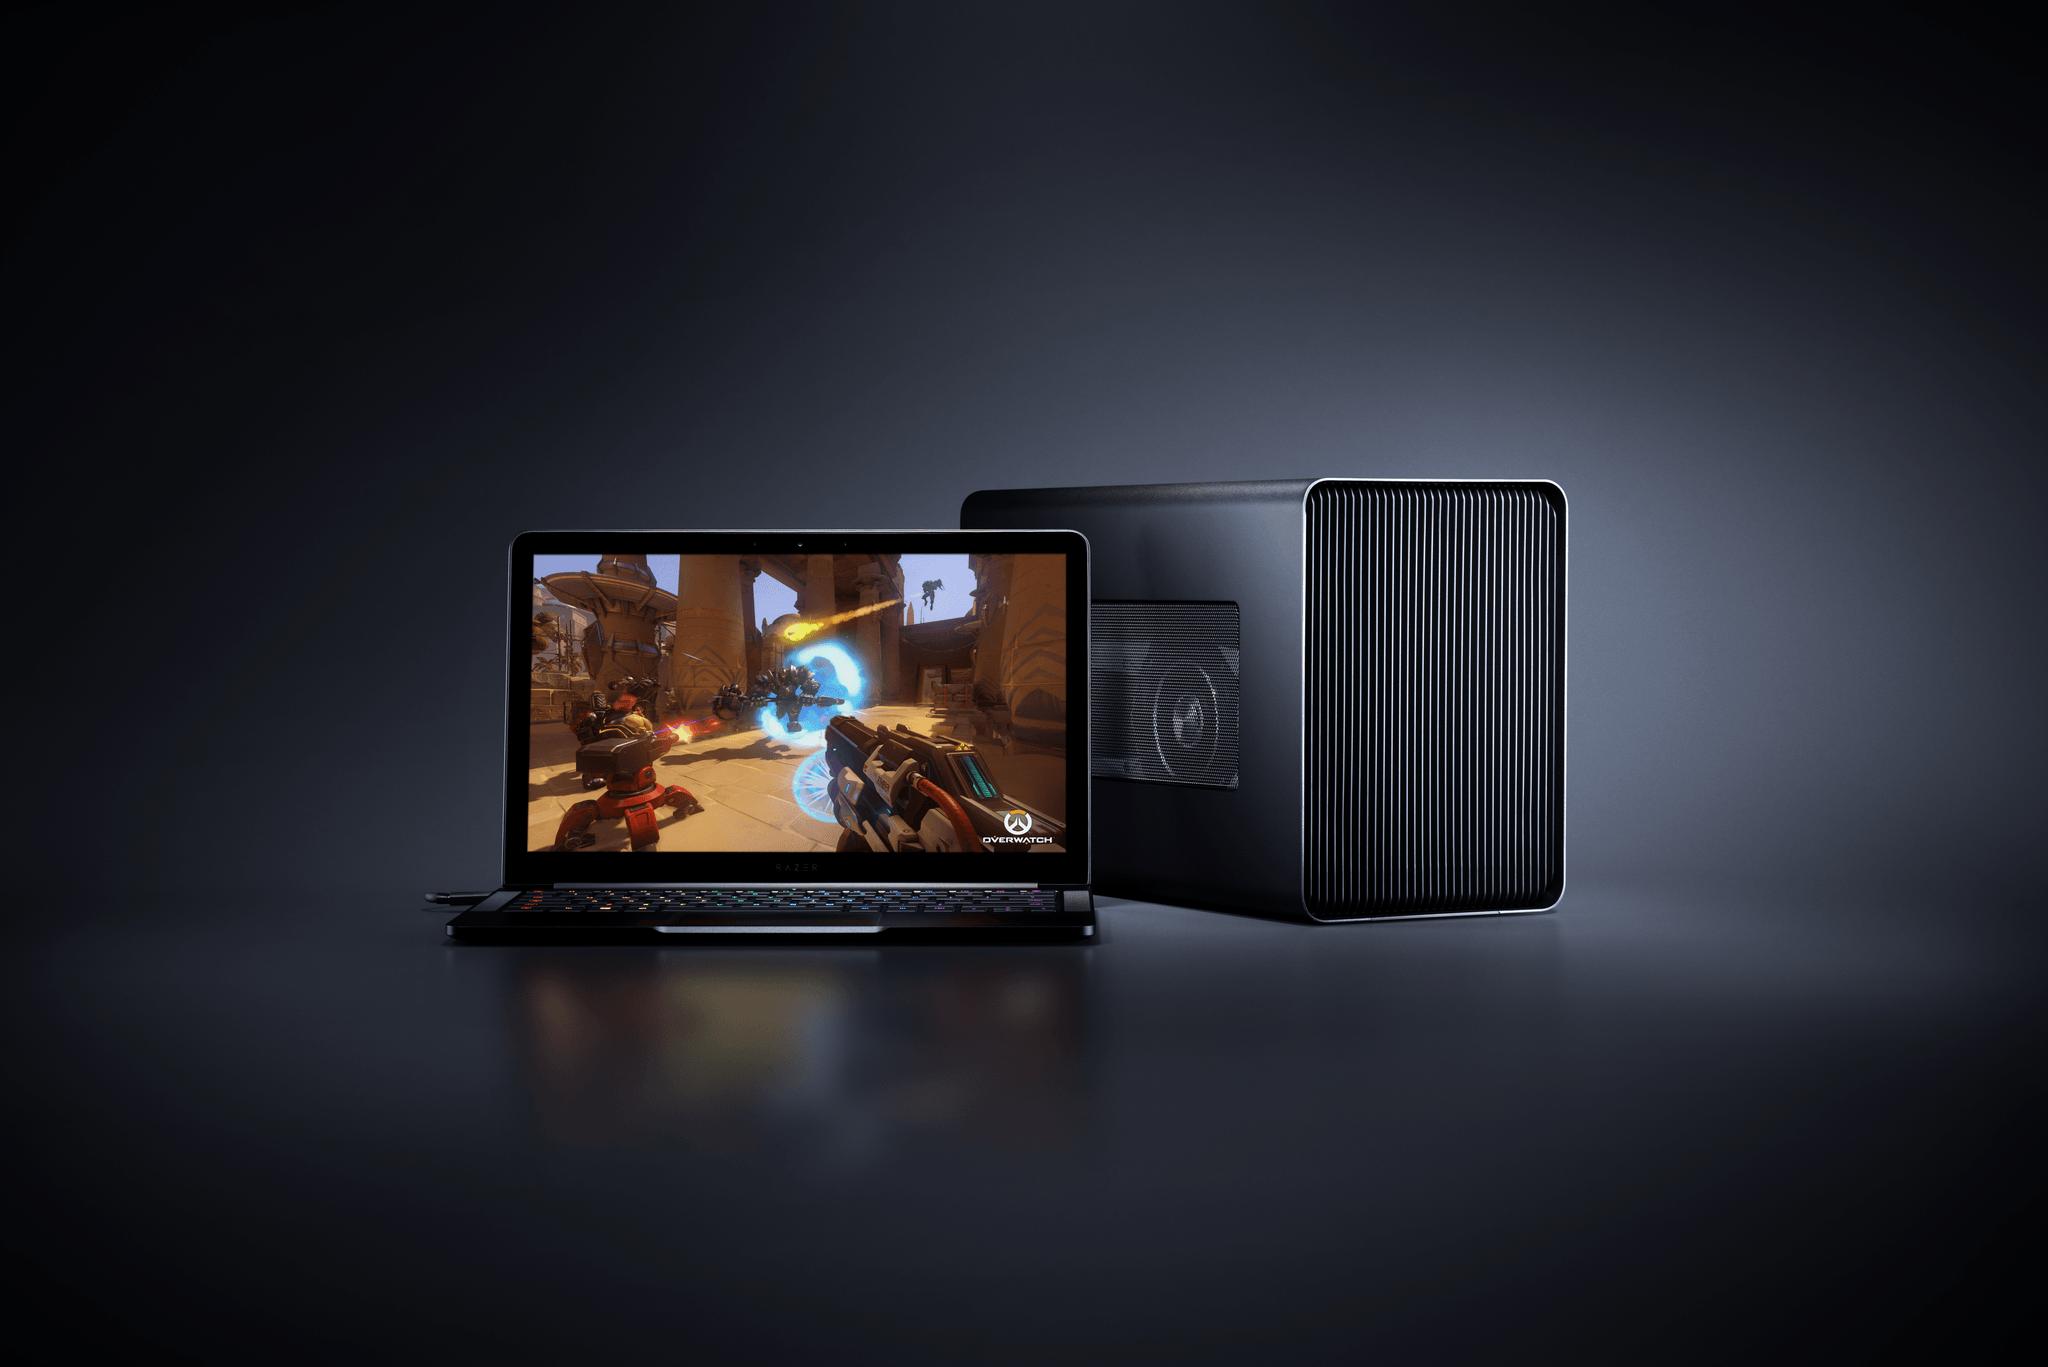 Razer Core X external GPU enclosure with 100 Watt charging power